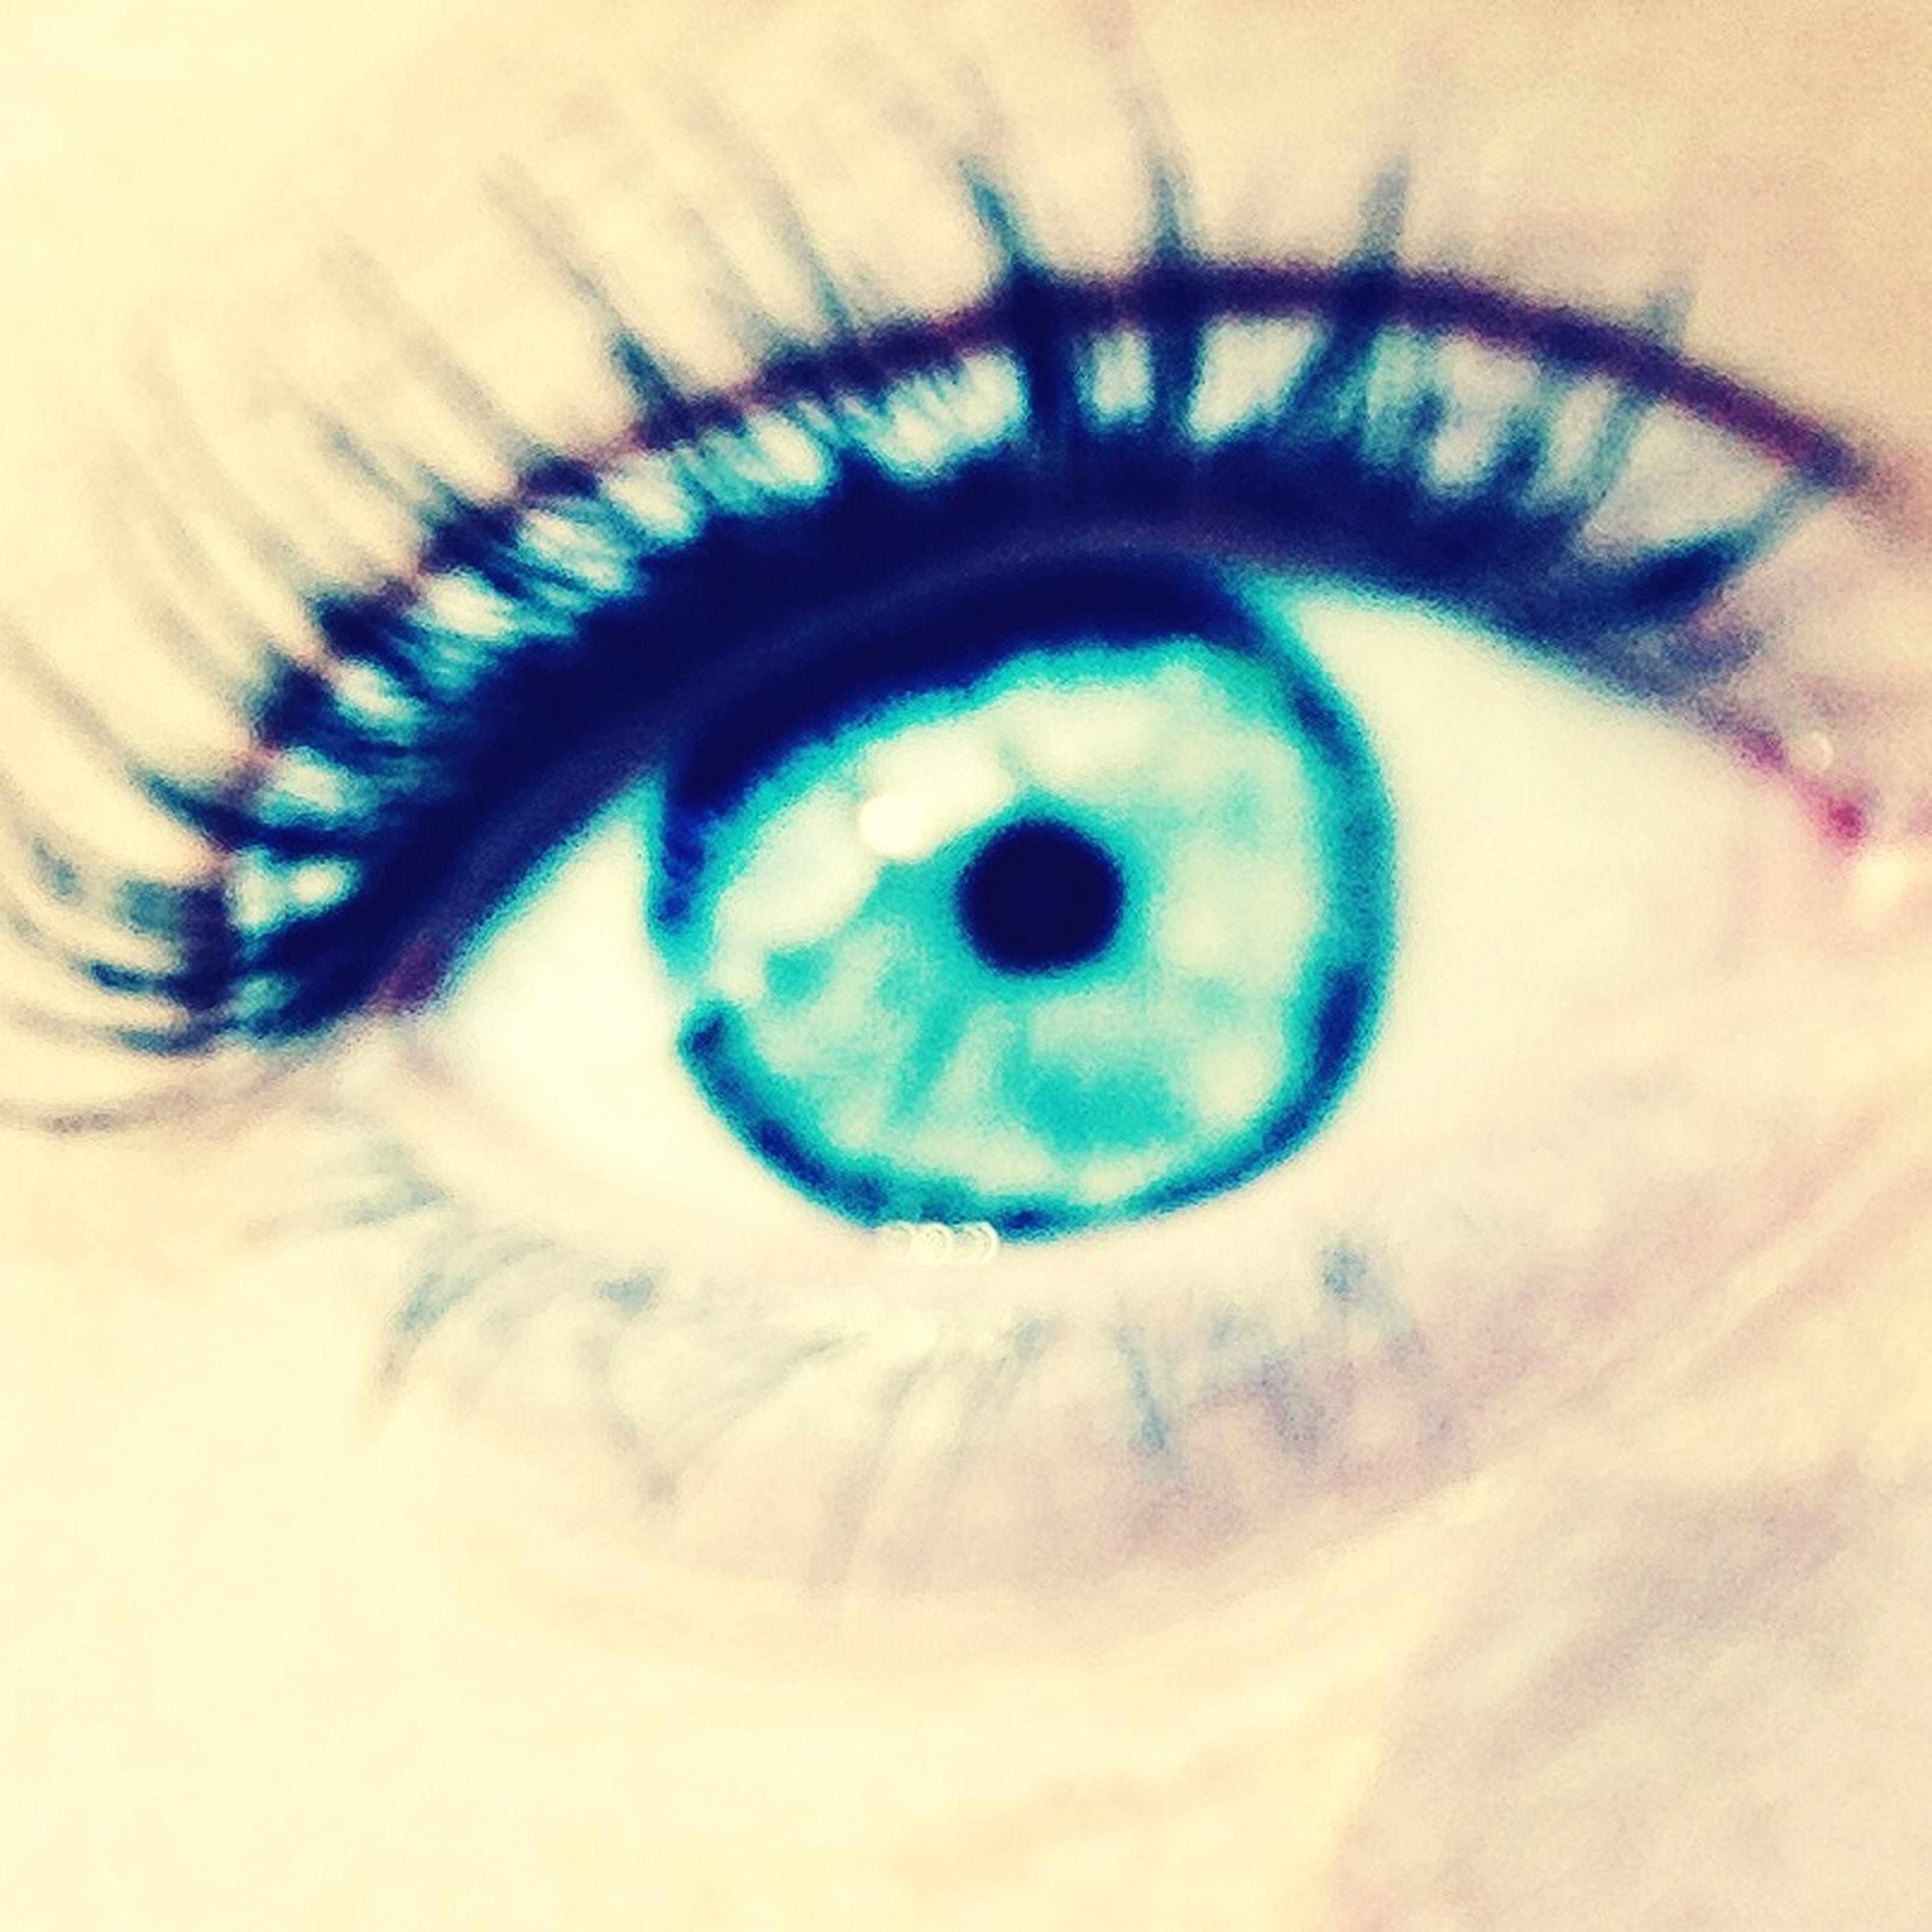 human eye, close-up, eyesight, indoors, looking at camera, portrait, eyelash, circle, sensory perception, part of, iris - eye, human face, eyeball, lifestyles, leisure activity, unrecognizable person, extreme close-up